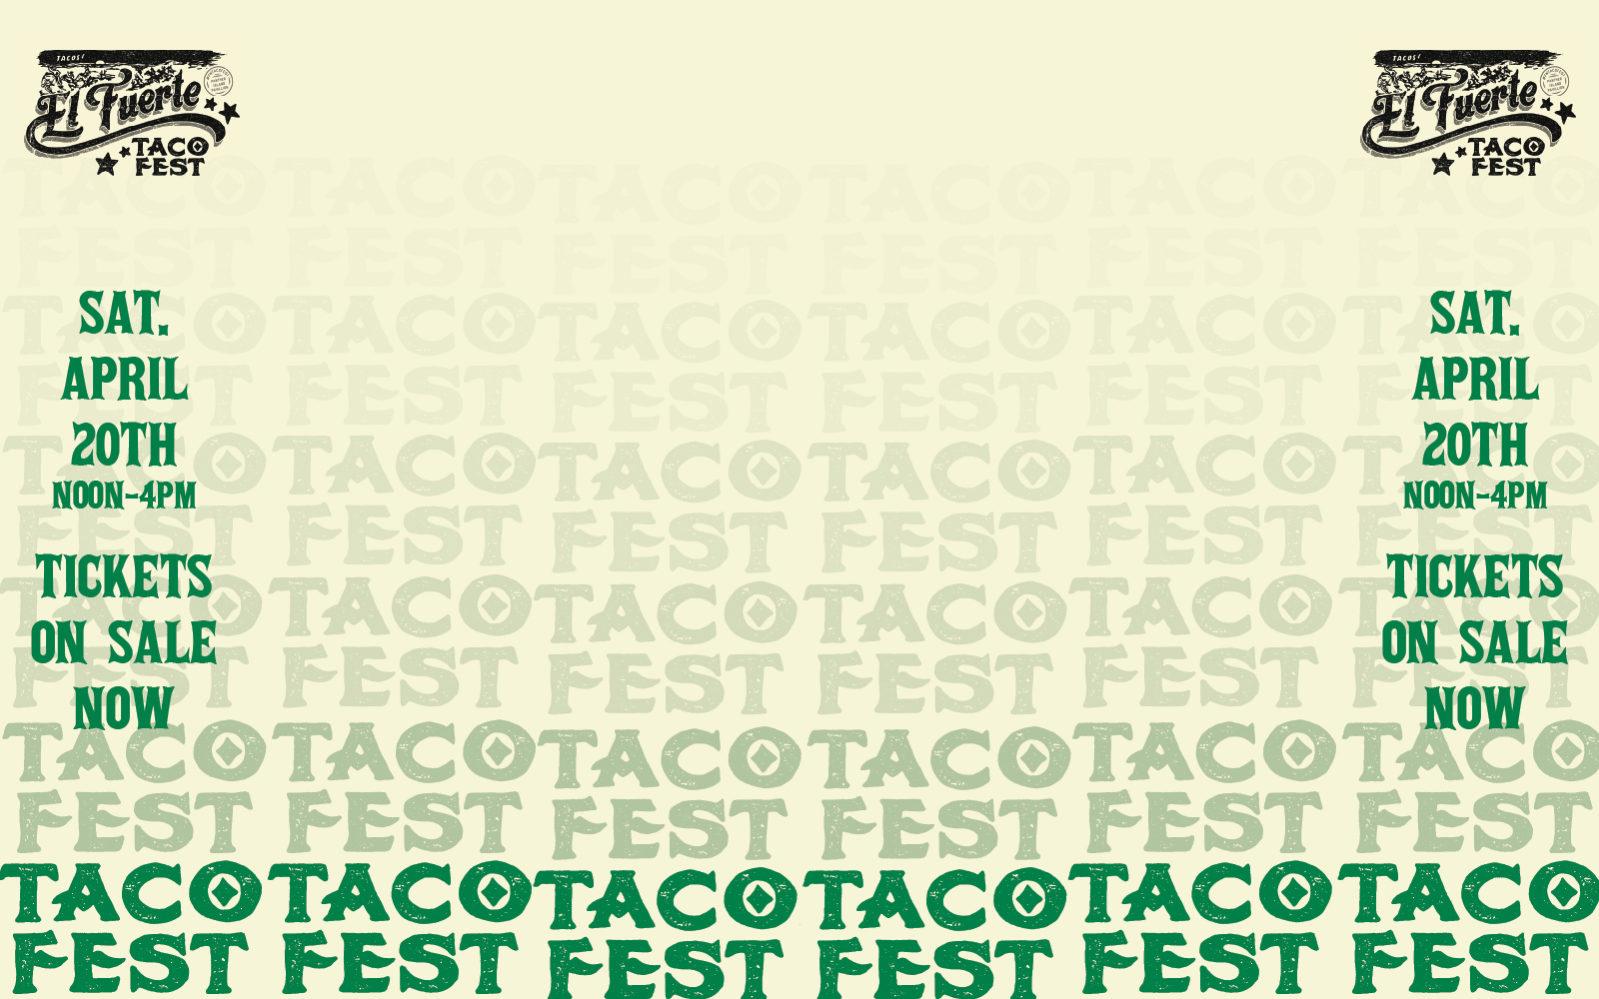 FW Taco Fest 1600x100